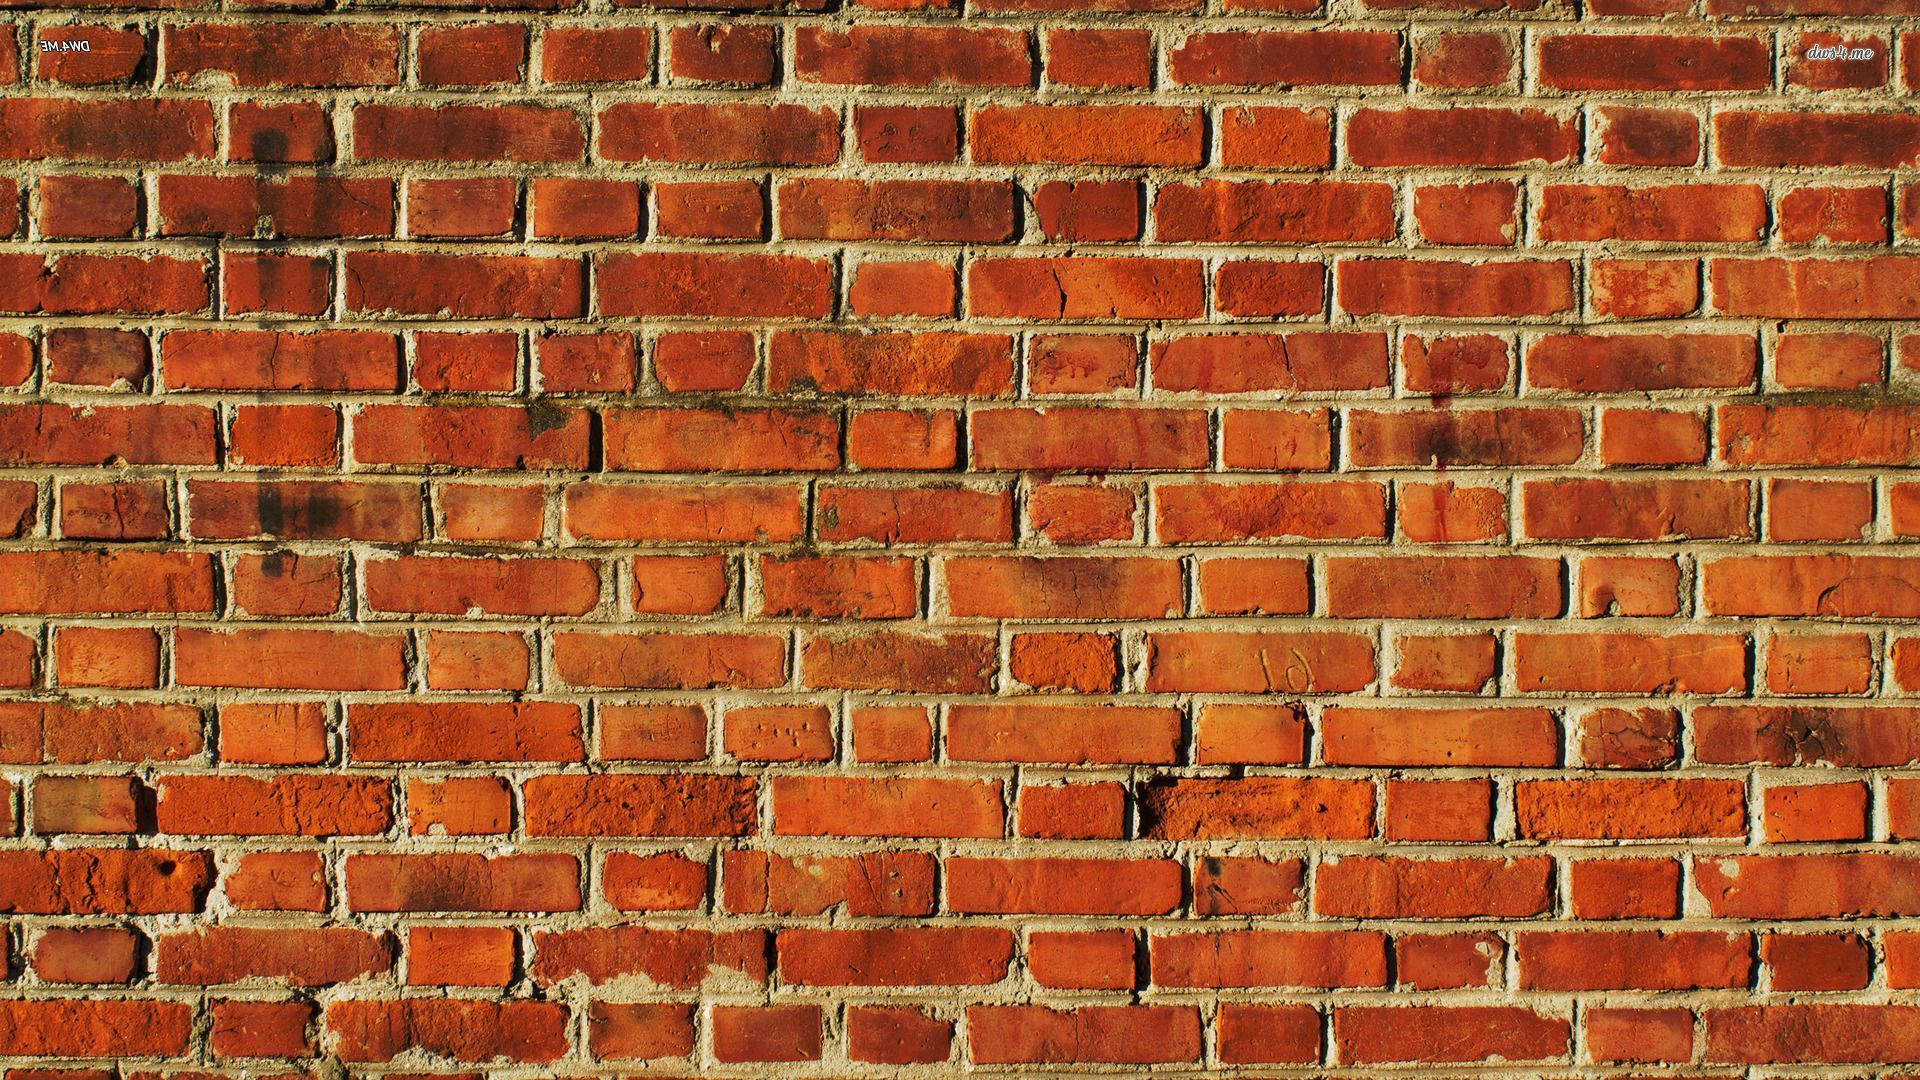 Brick wallpaper clipart jpg library Brick HD PNG Transparent Brick HD.PNG Images. | PlusPNG jpg library